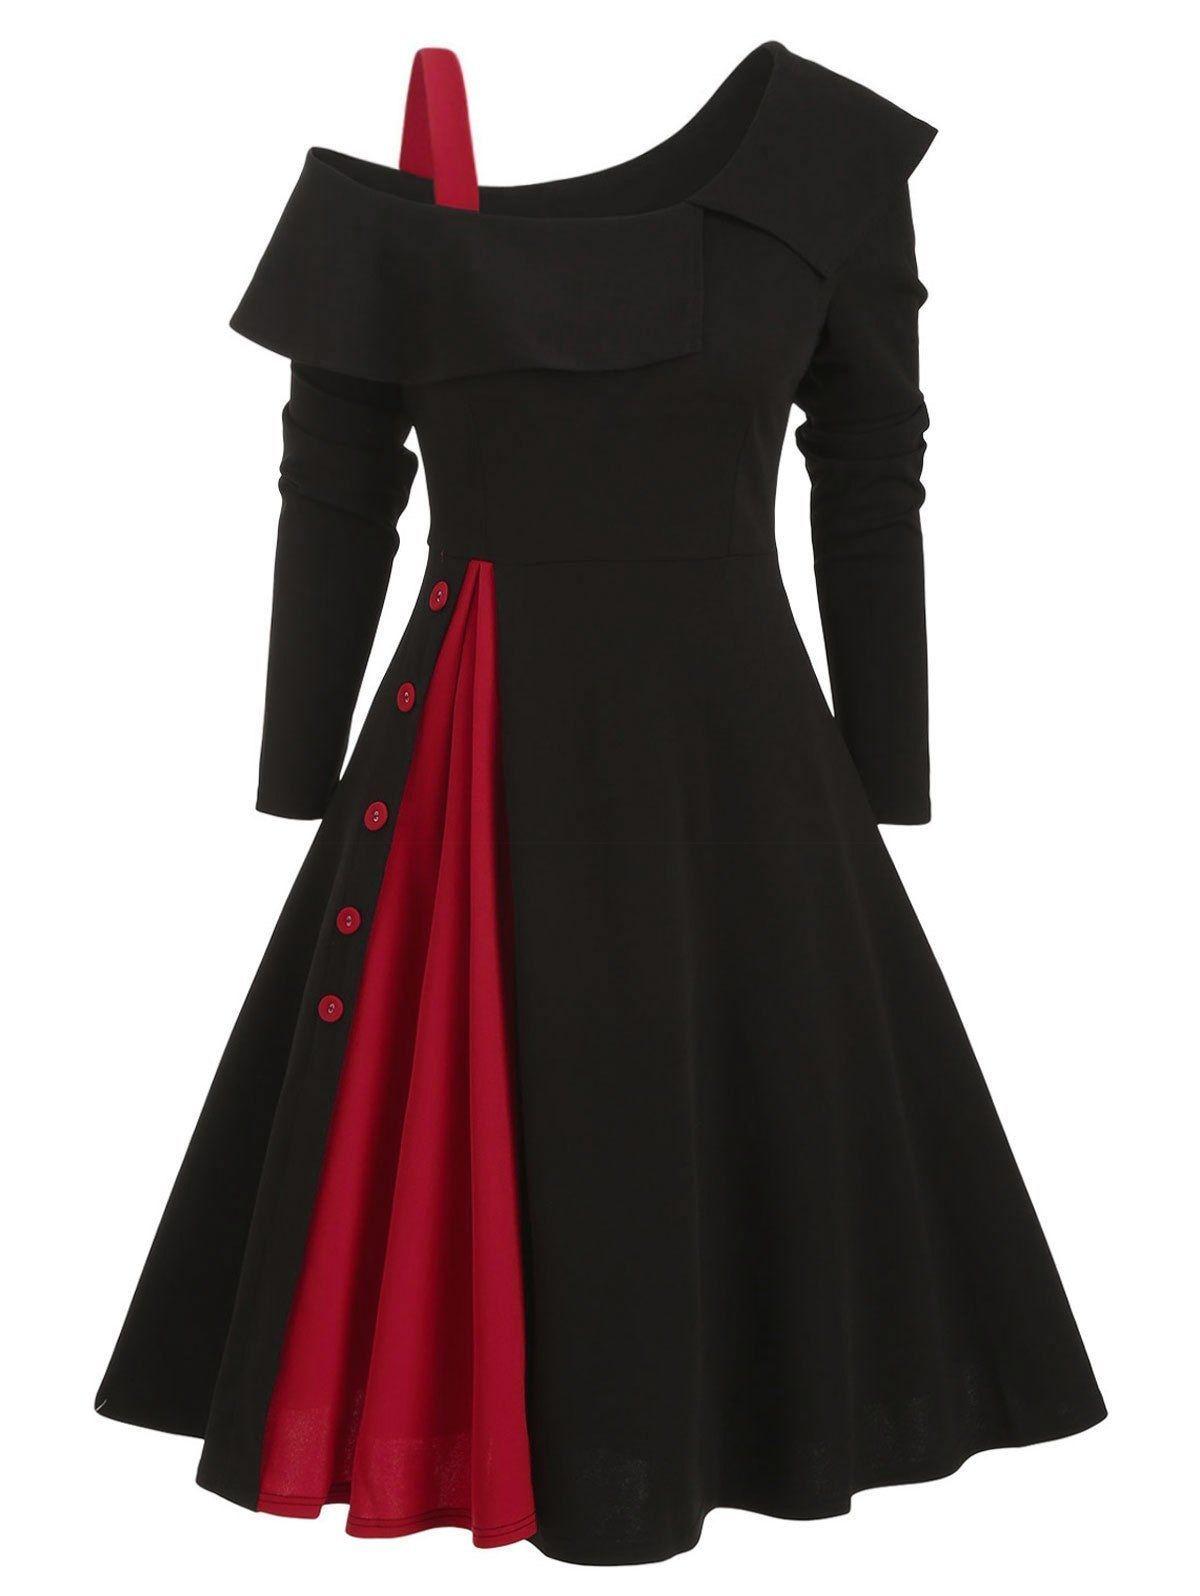 Dresslily Com Photo Gallery Skew Neck Button Embellished Colorblock Dress Dresslily Com Photo Gallery In 2020 Fashion Dresses Pretty Dresses Beautiful Dresses